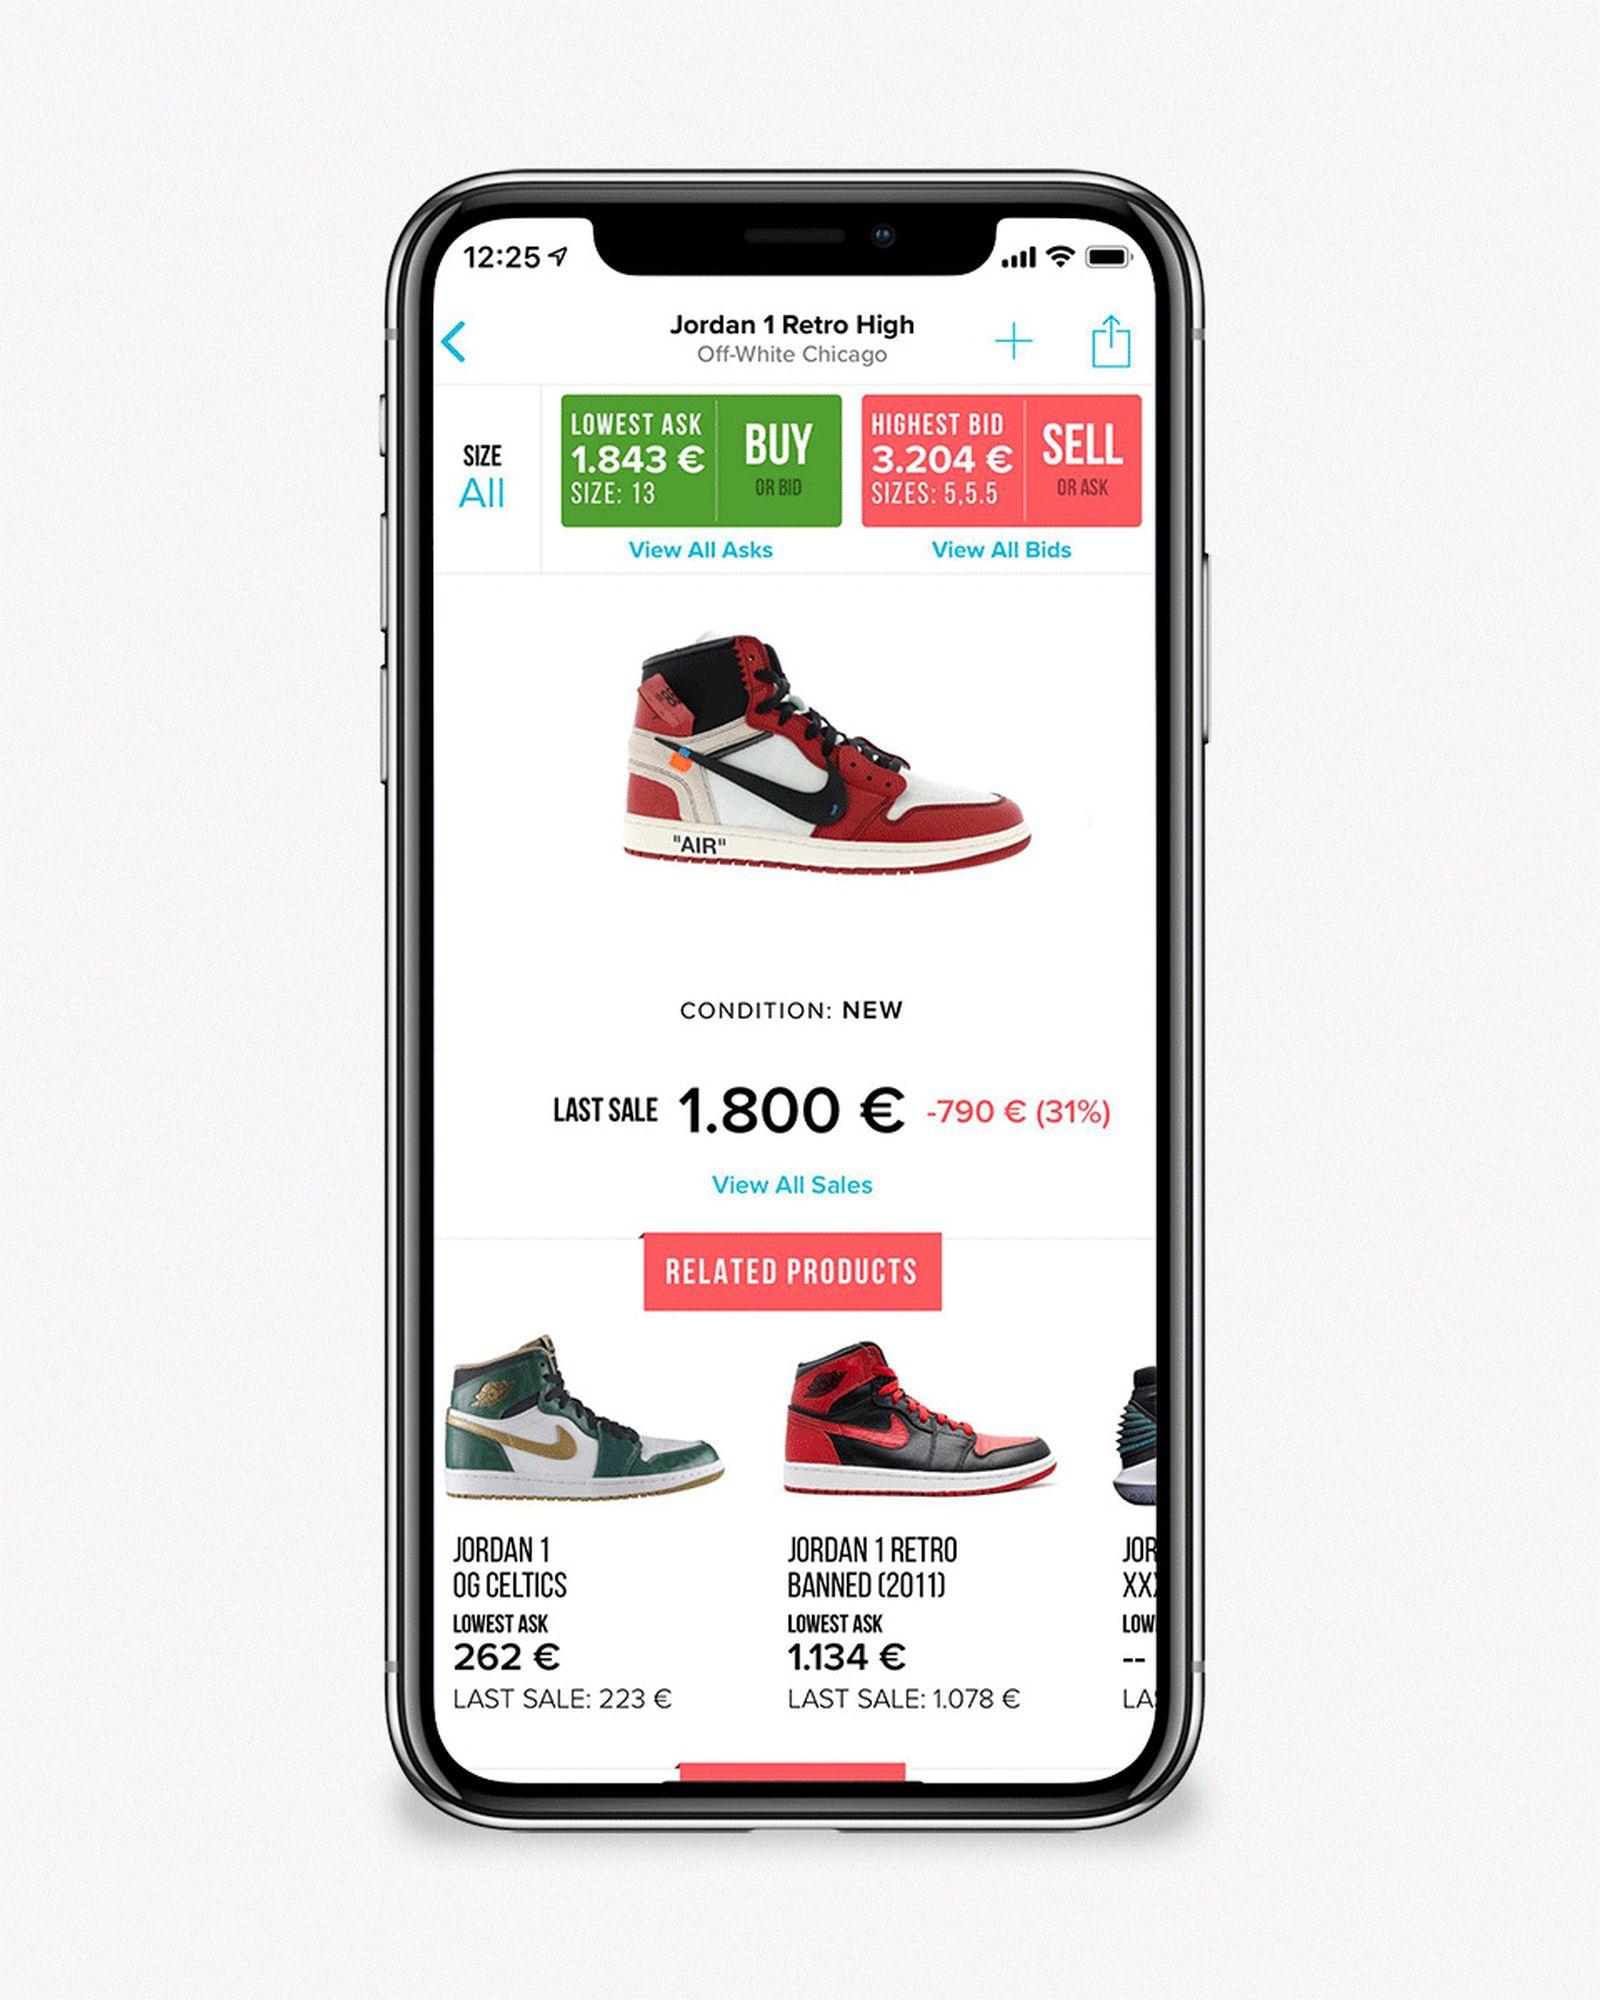 sneaker reselling sites roundup stockx Flight Club GOAT stadium goods